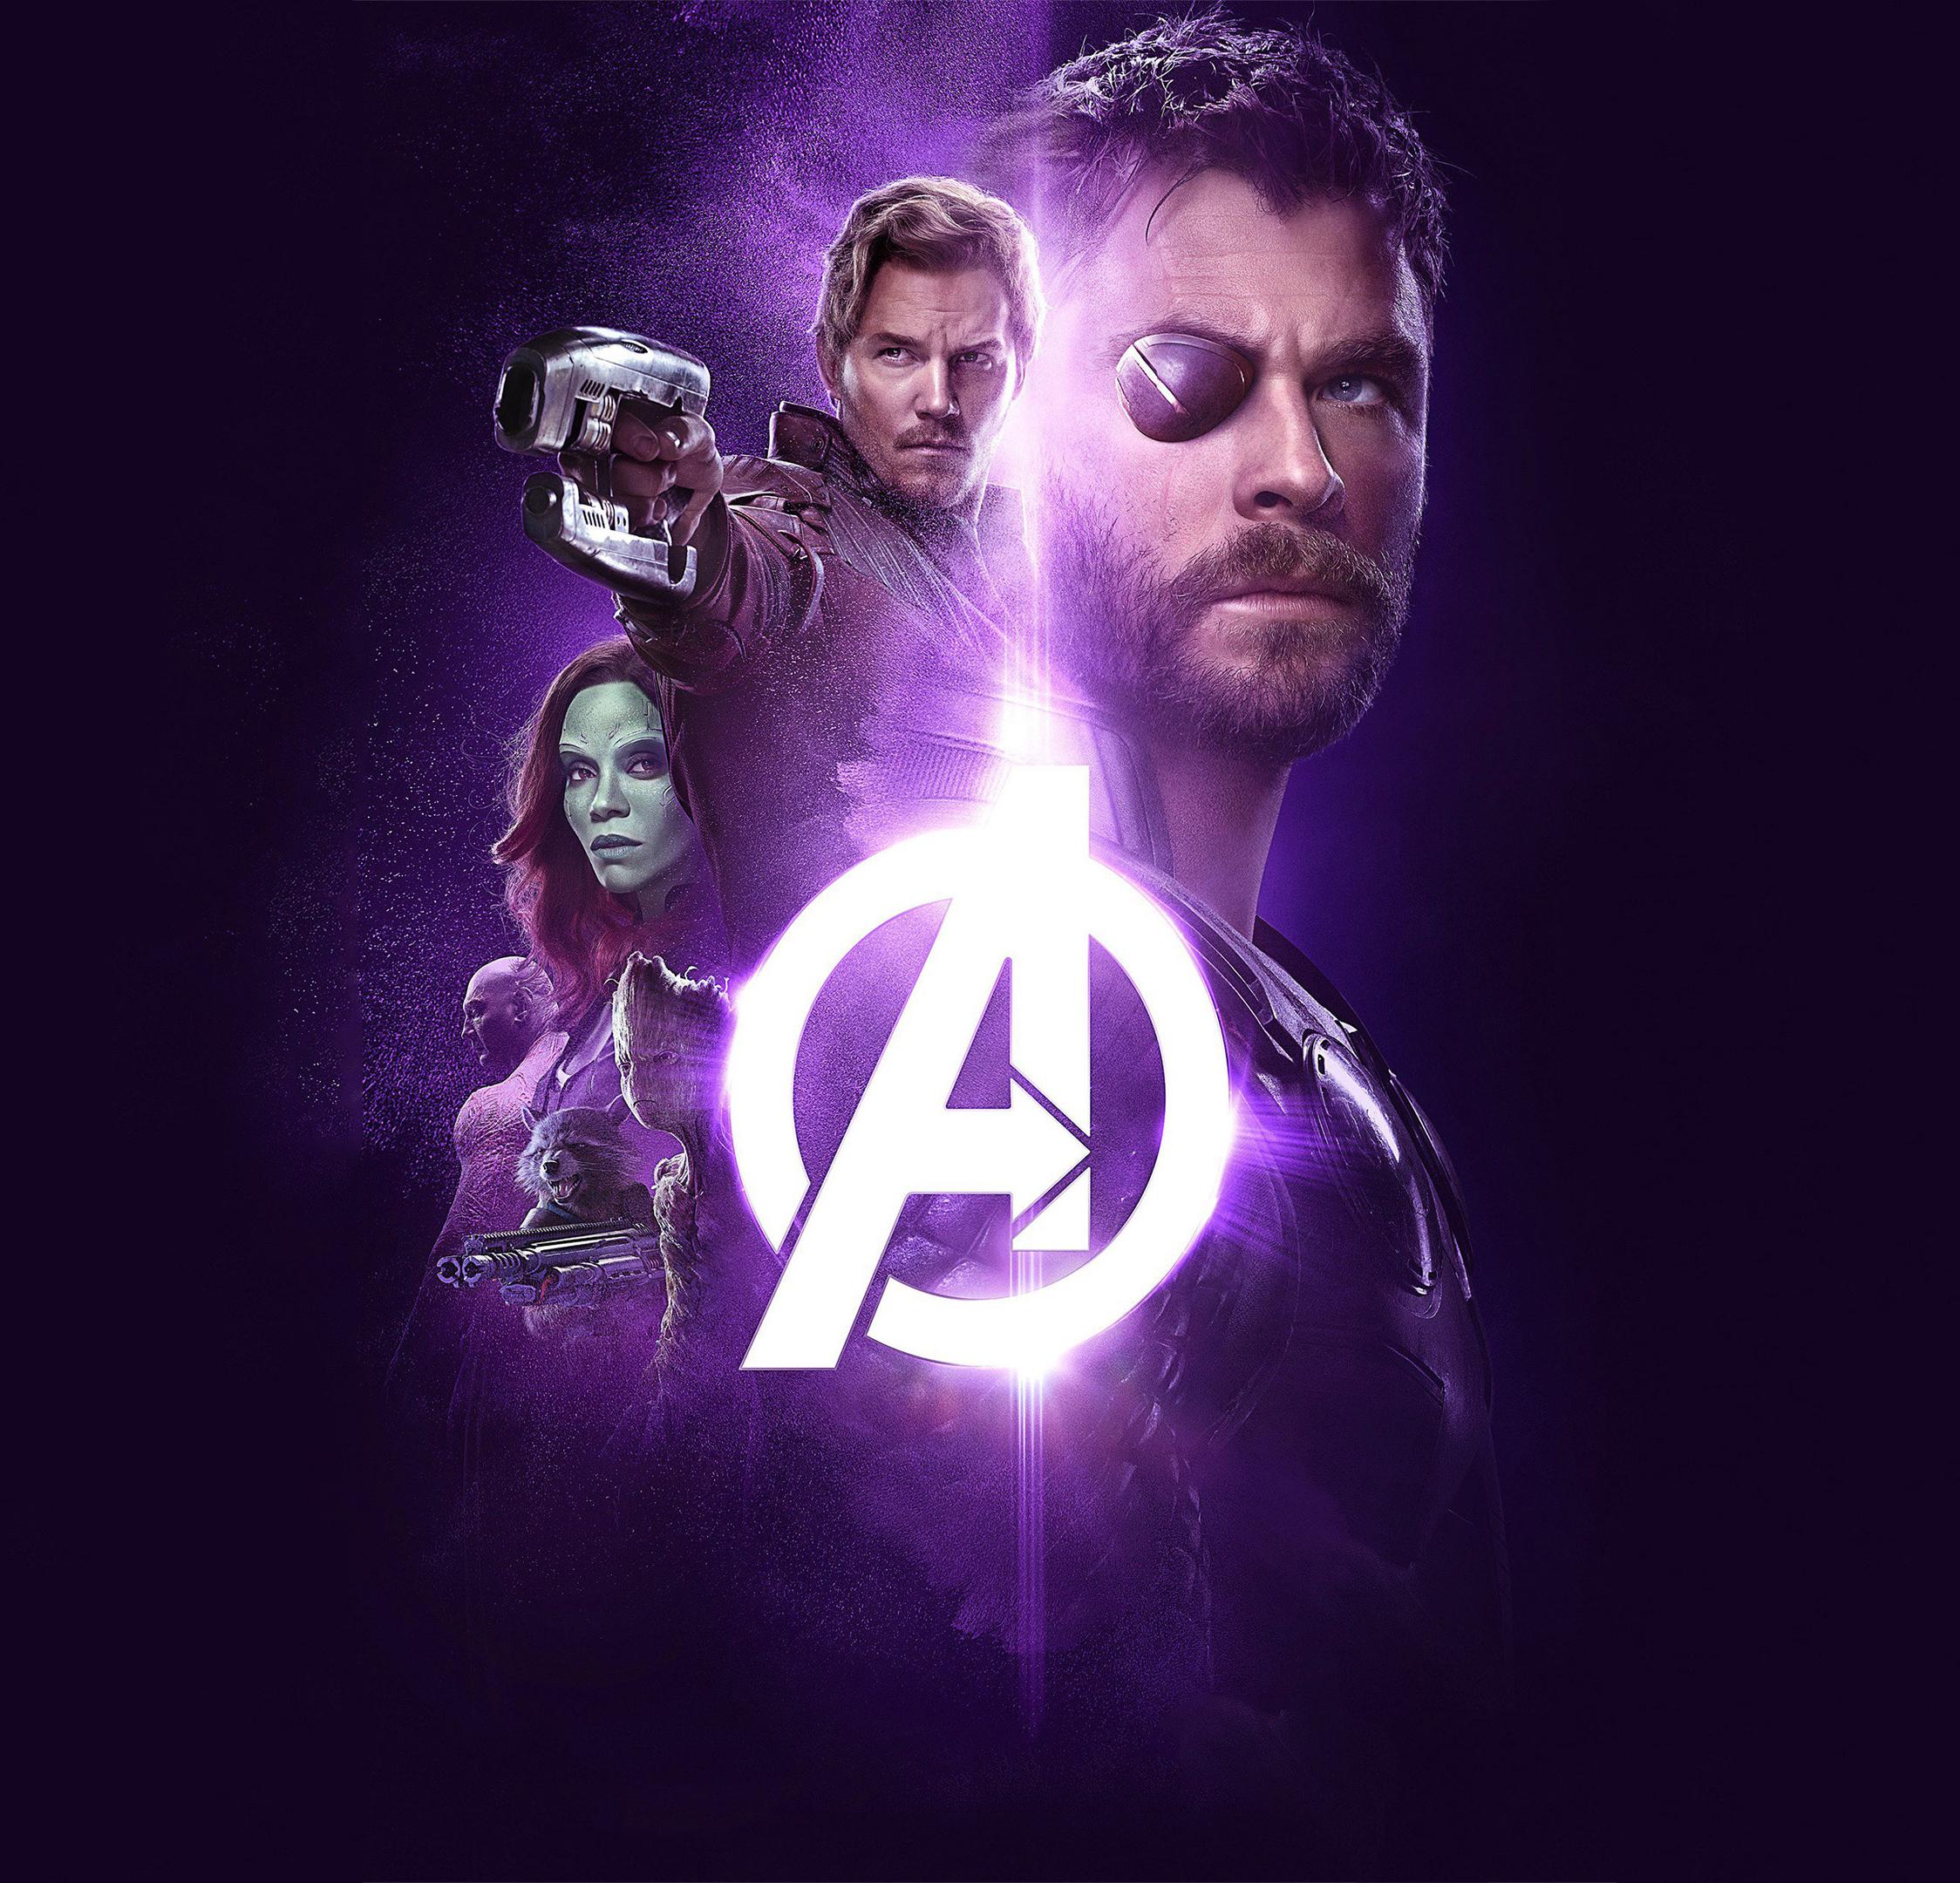 Simple Wallpaper Movie Ipad - avengers-infinity-war-2018-power-stone-poster-4k  HD_38584.jpg